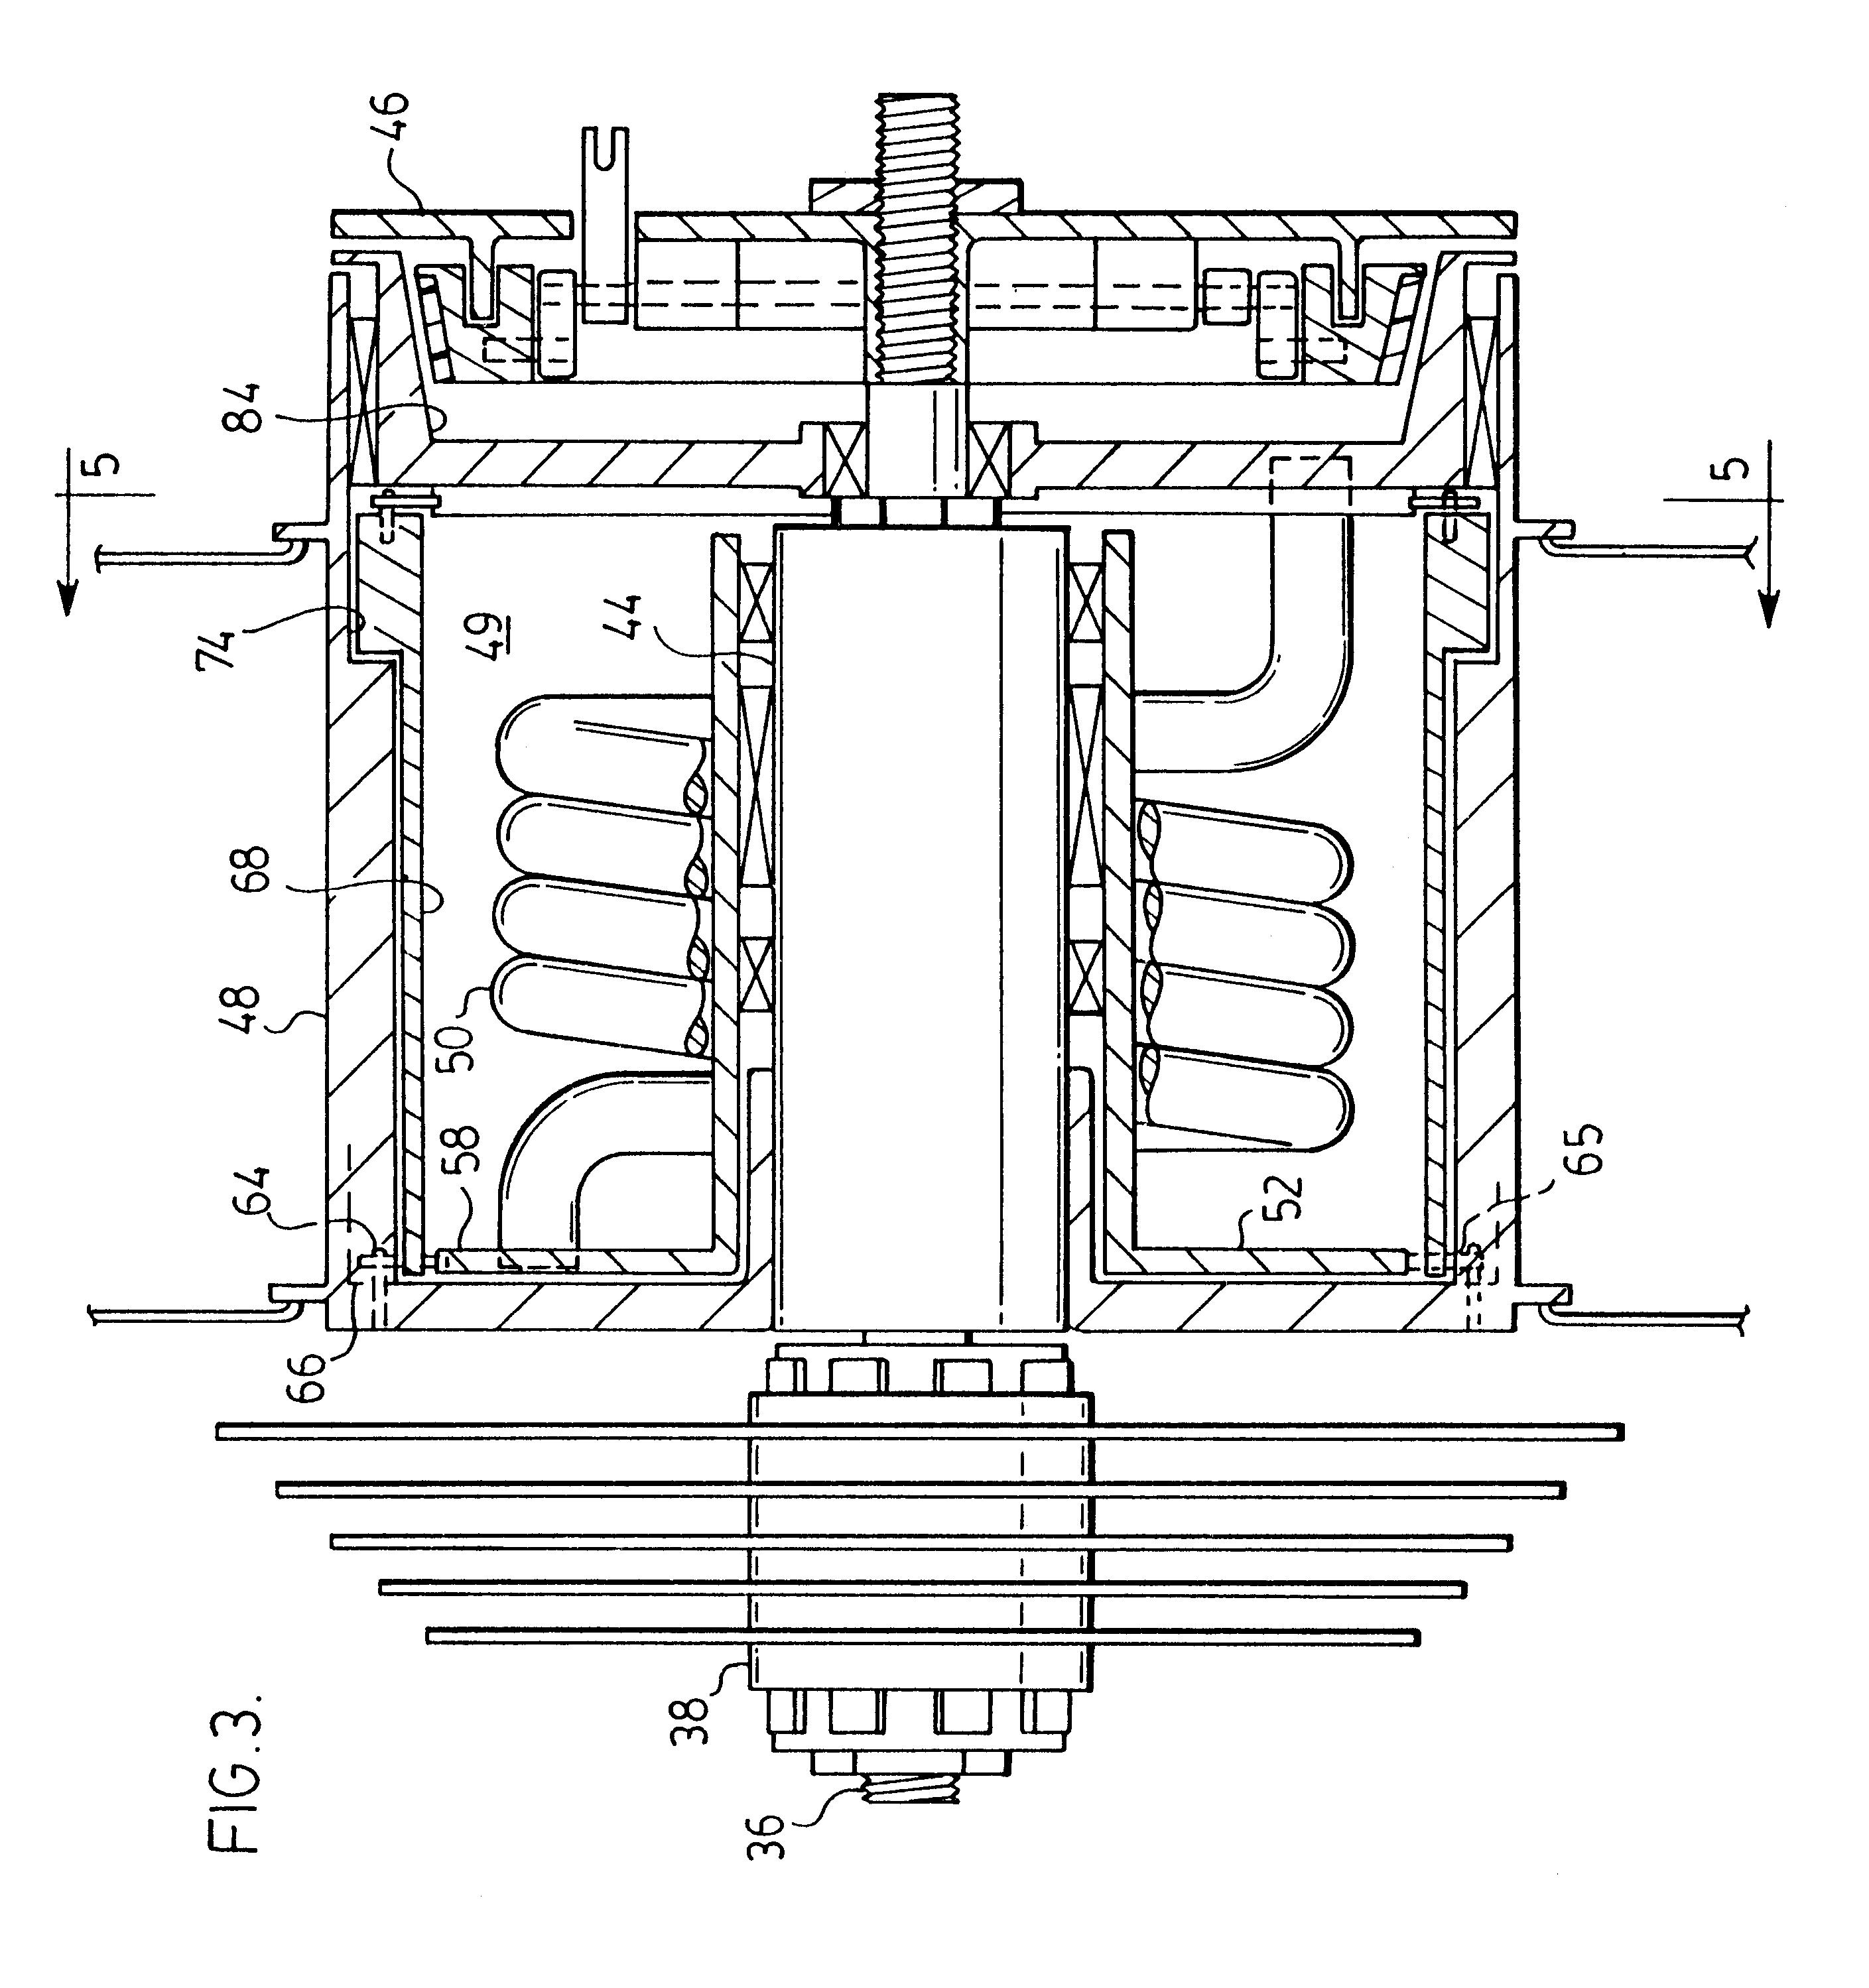 Us6557877 Regenerative Braking And Driving Diagram Patent Drawing